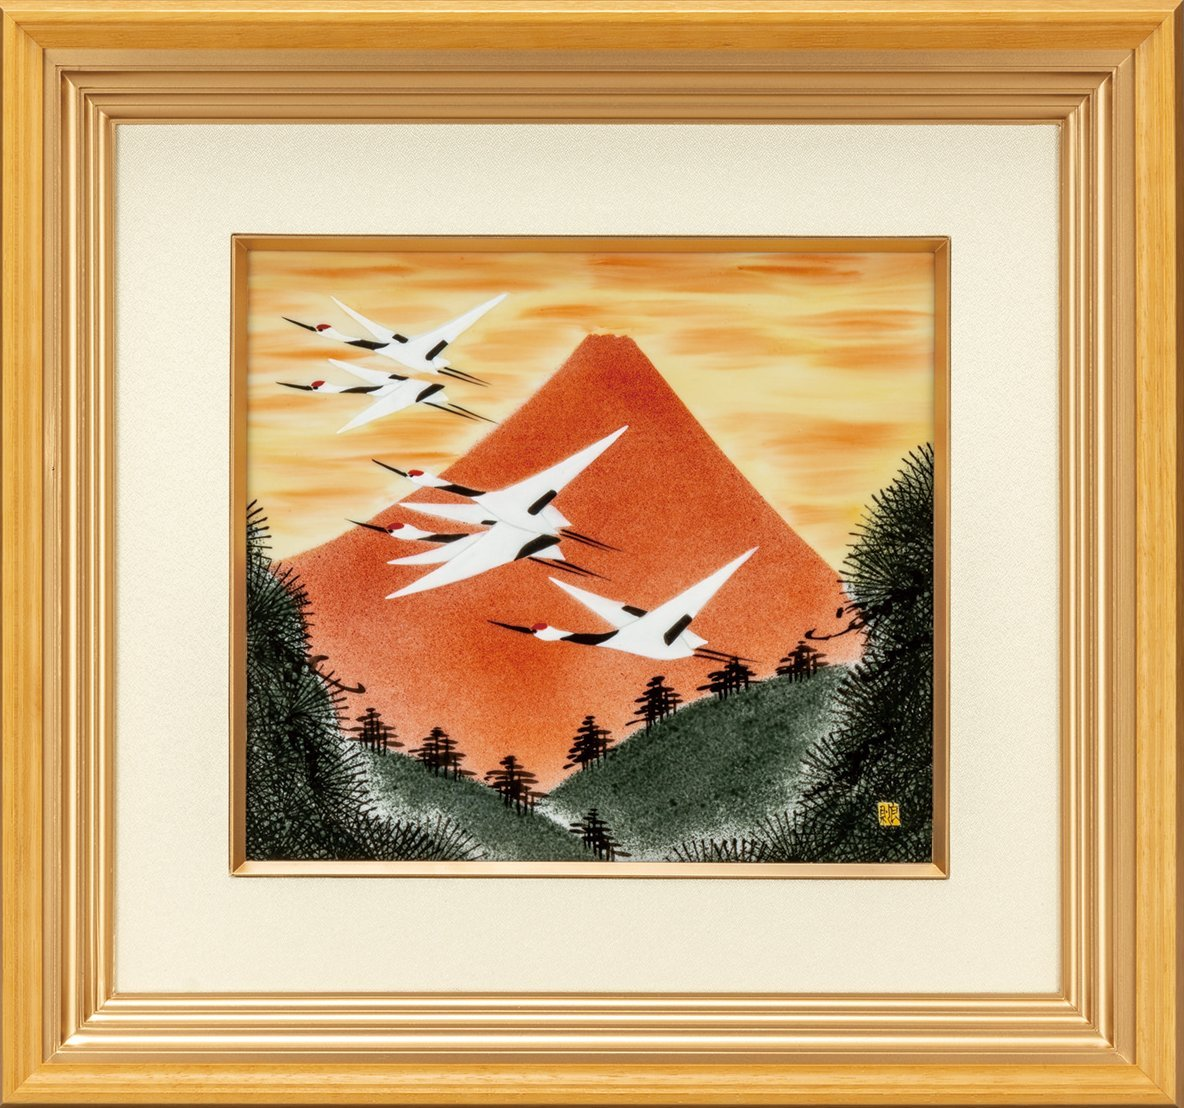 【送料無料】九谷焼ギフト ご贈答品 御祝い 九谷焼陶額 赤富士に鶴 福田良則